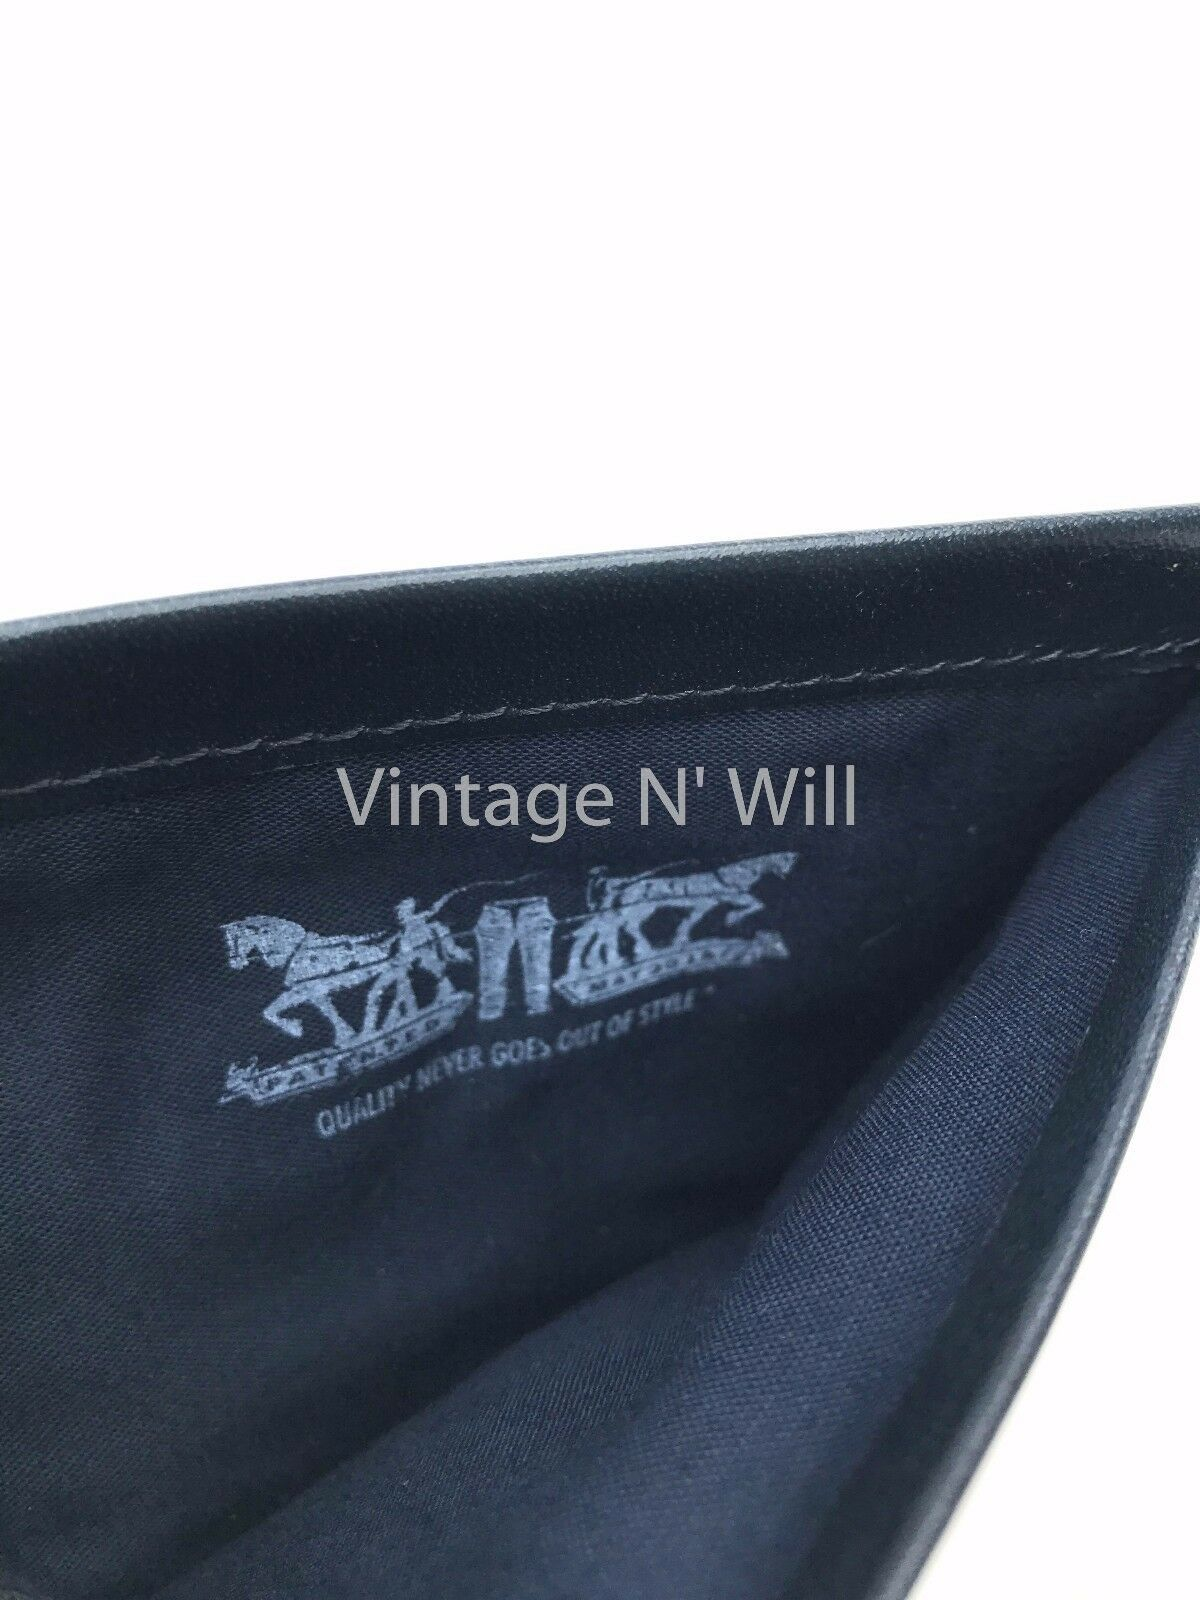 Levis Jeans Mens 511 Slim Navy Blue Genuine Leather Wallet Billfold Bifold Card image 9